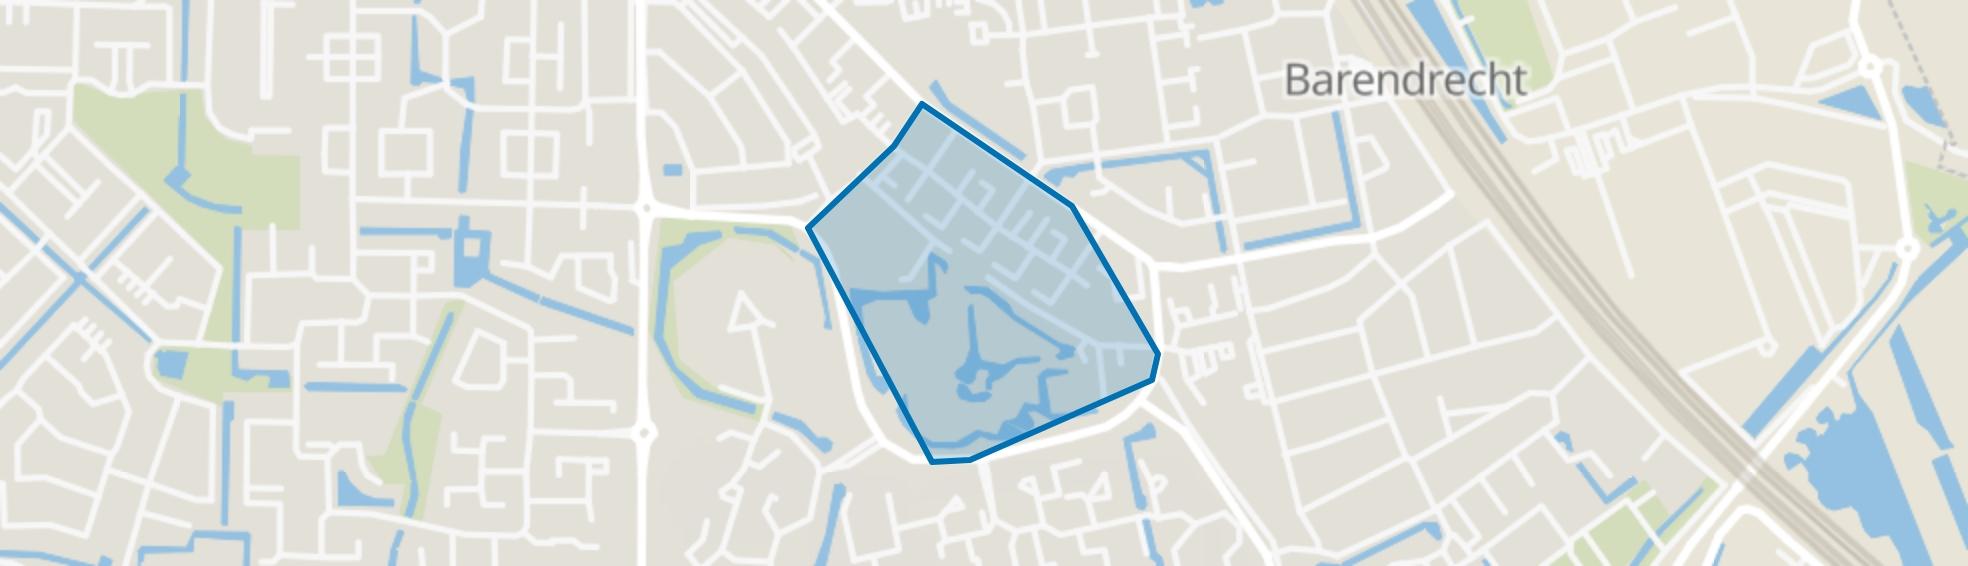 Centrum Oost, Barendrecht map